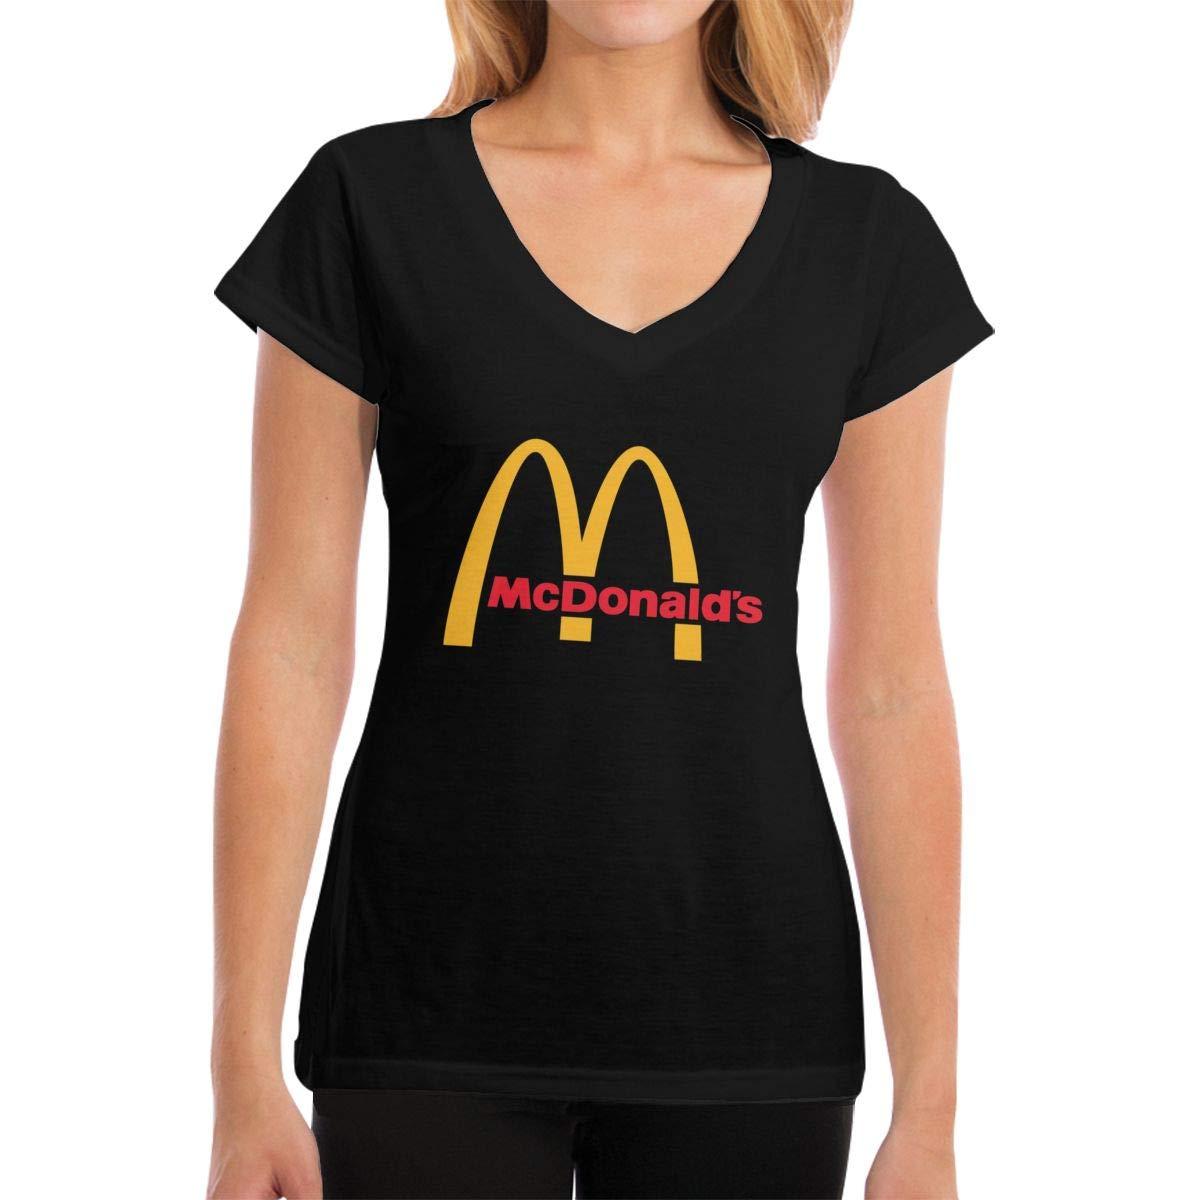 Lakssn Women's Youth Girls McDonalds Logo Tee Shirts Short Sleeve T Shirt for Women Girls T-Shirt Round Neck Cotton Tshirt Black XL by Lakssn